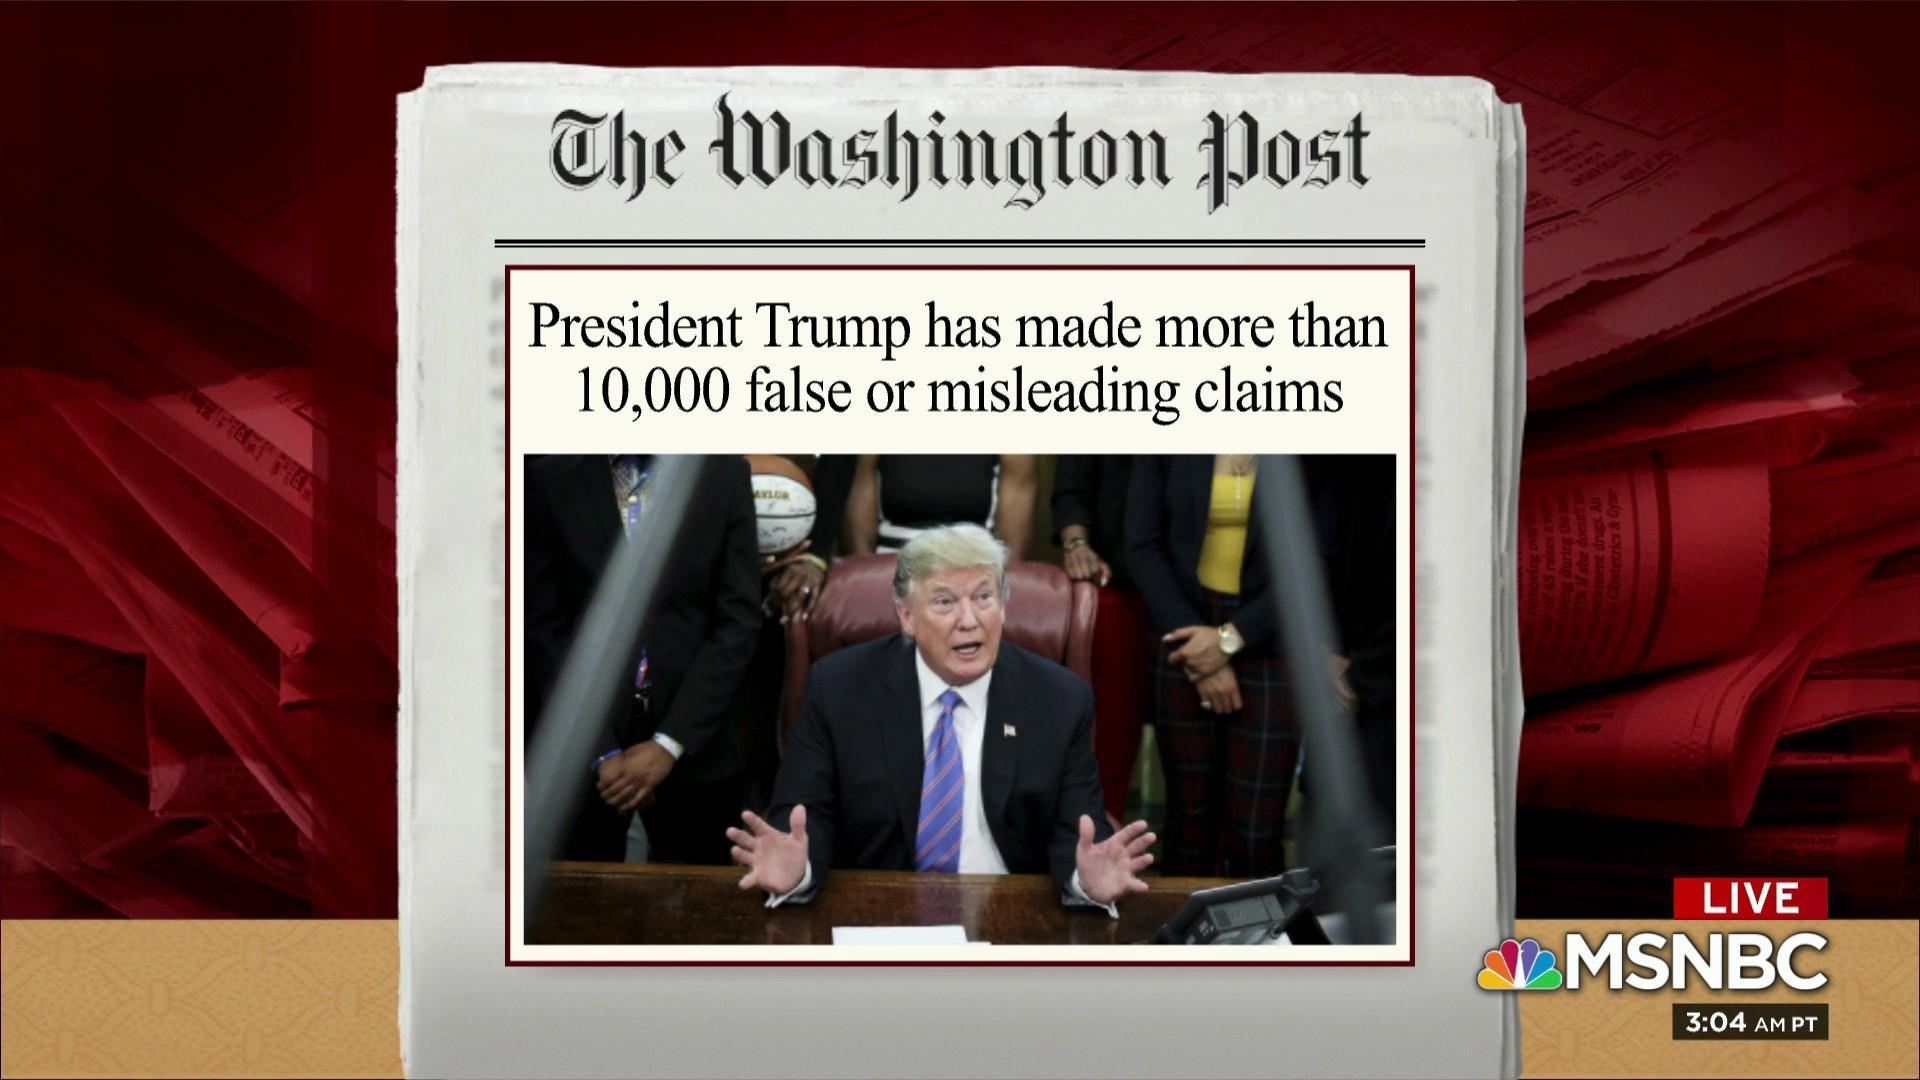 Trump makes more than 10,000 false, misleading claims: WaPo